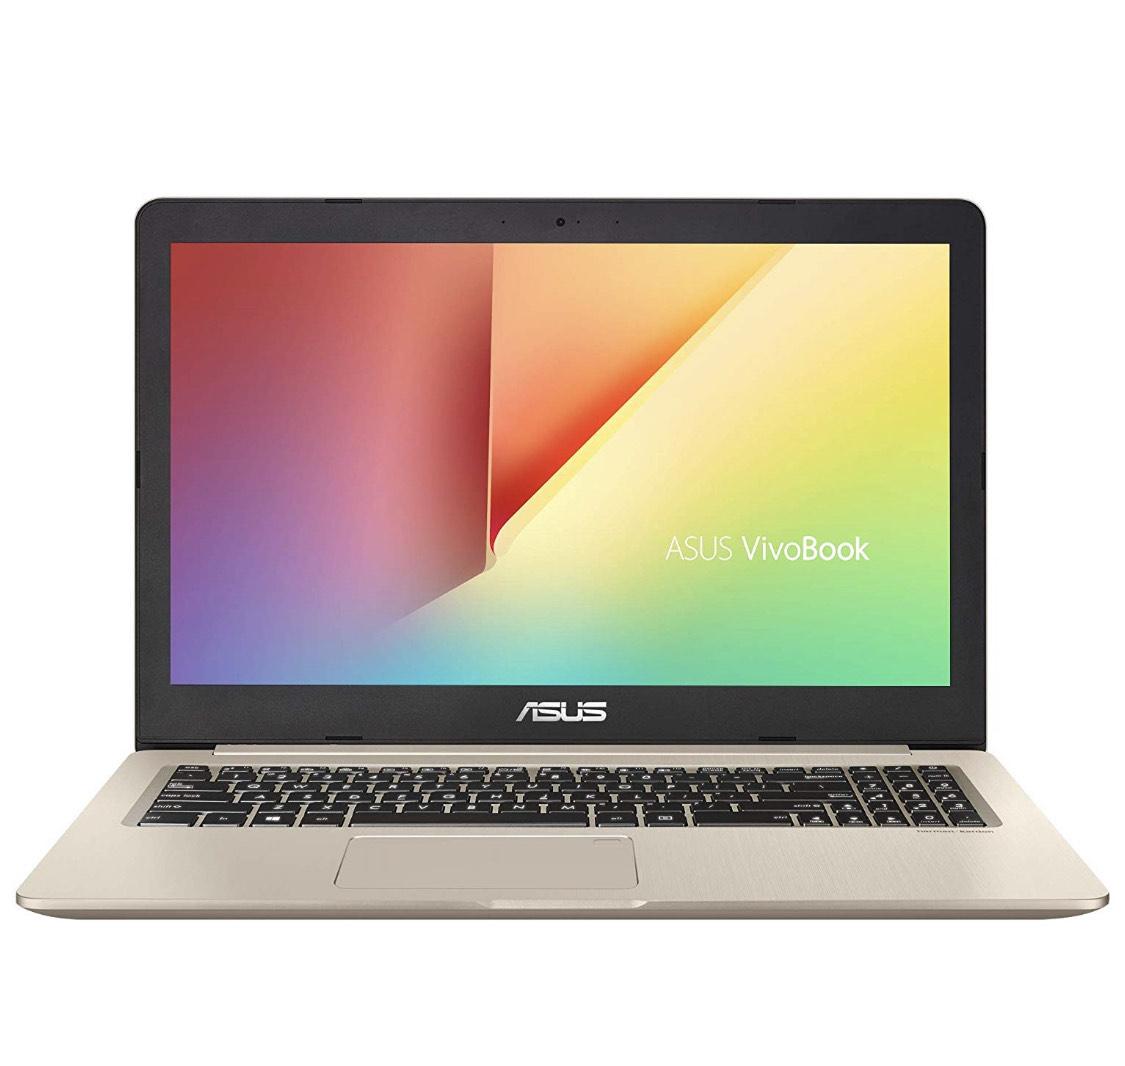 "ASUS VivoBook Pro 15 N580GD-E4189T - Portátil de 15.6"" FHD (Intel Core i7-8750H, 8 GB RAM + 16GB, 1 TB HDD, NVIDIA GeForce GTX1050 4 GB"